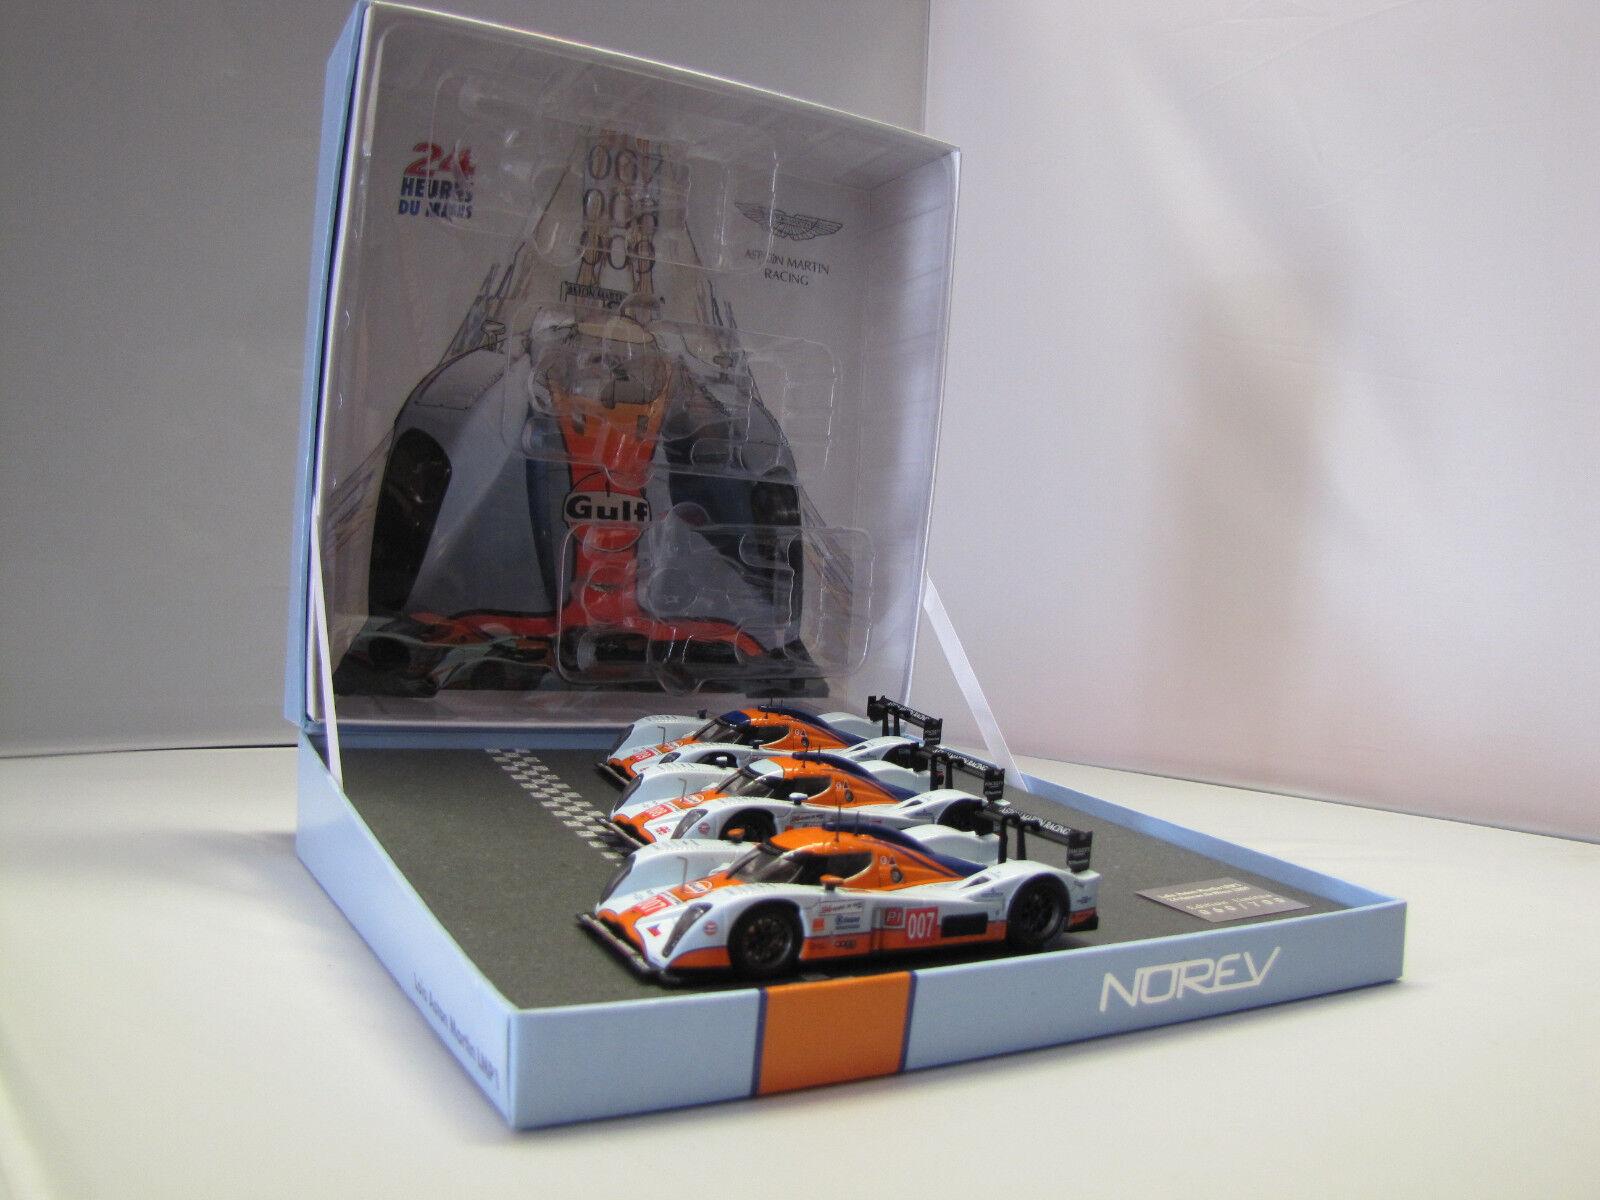 NOREV-Lola Aston Martin lmp1 24 Heures du Mans 2009 Gulf SPECIALE EDITION - 1 43